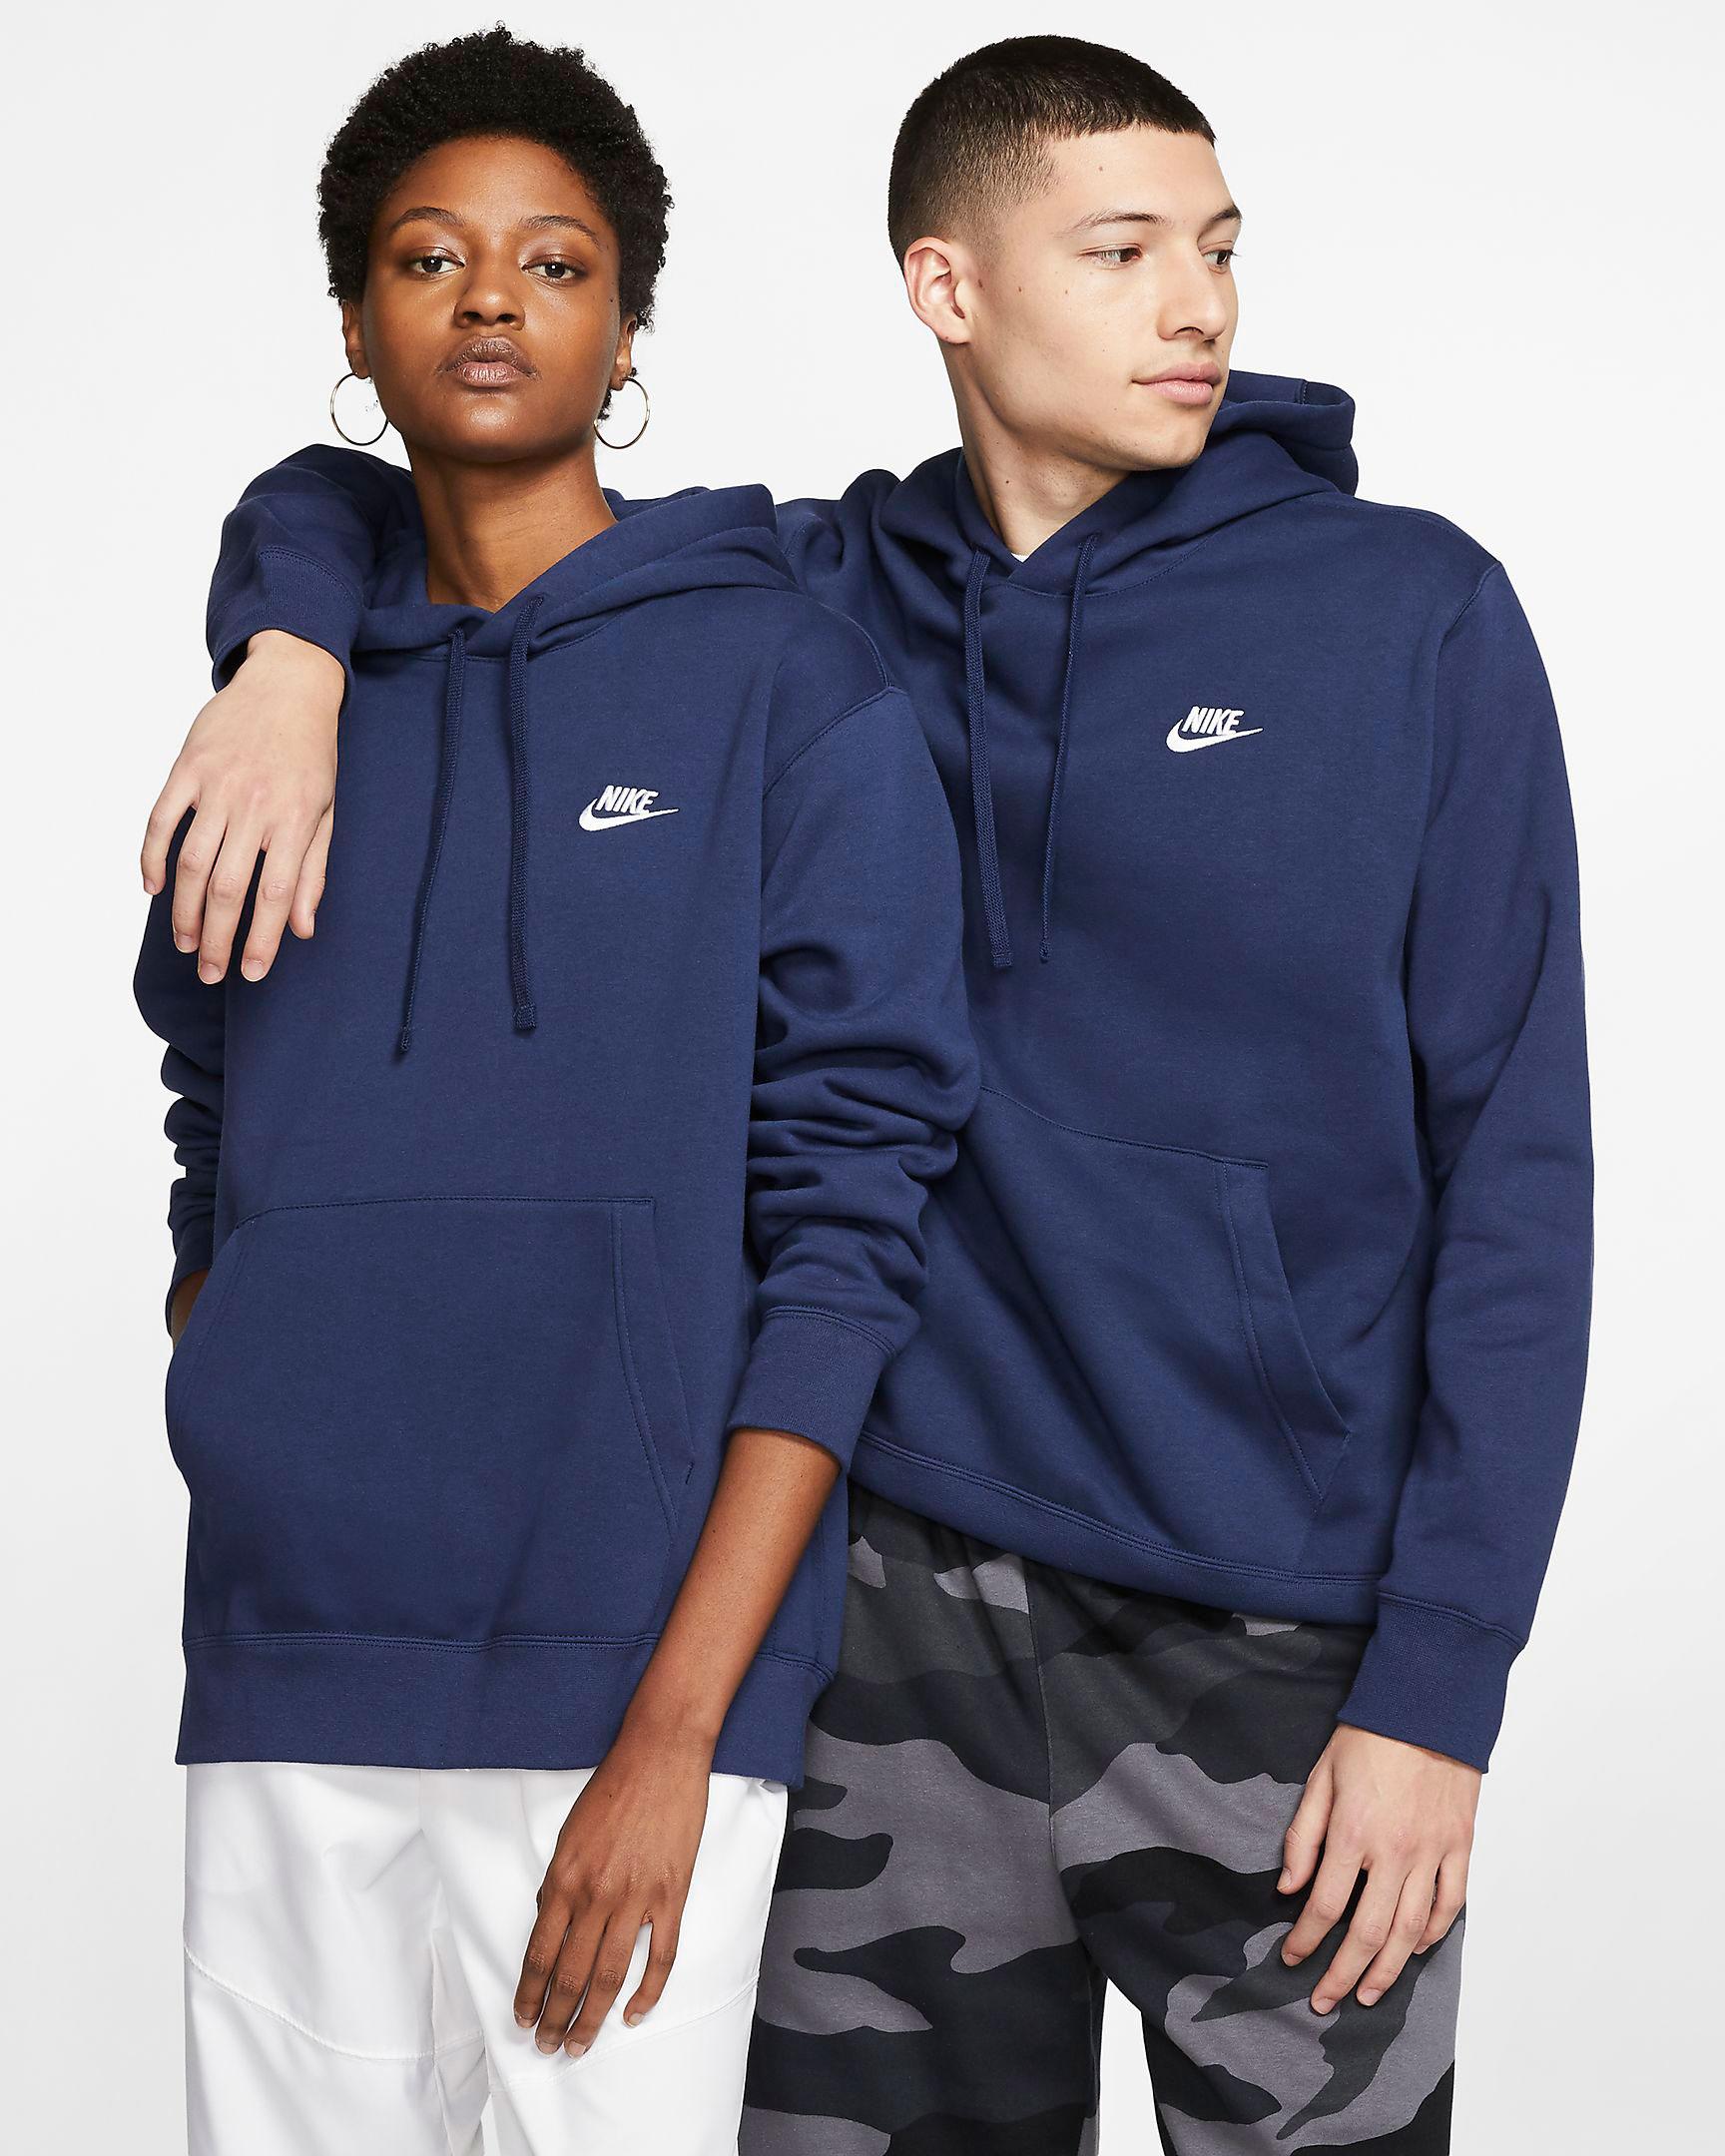 jordan-1-bio-hack-nike-hoodie-match-navy-blue